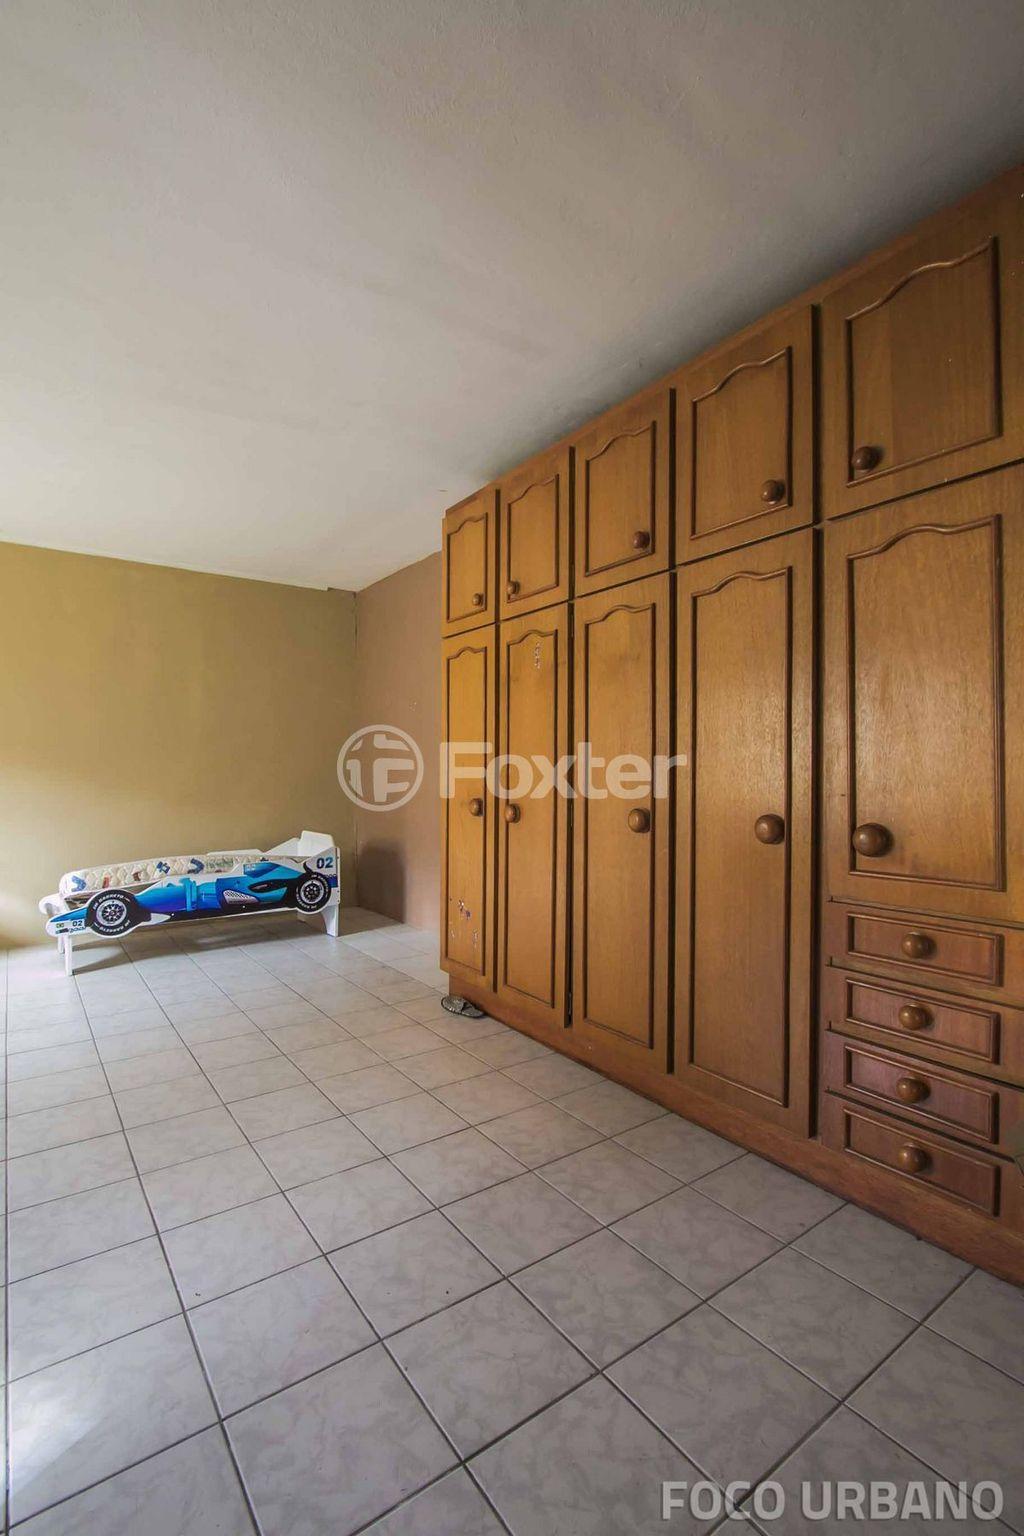 Casa 4 Dorm, Cavalhada, Porto Alegre (125338) - Foto 22